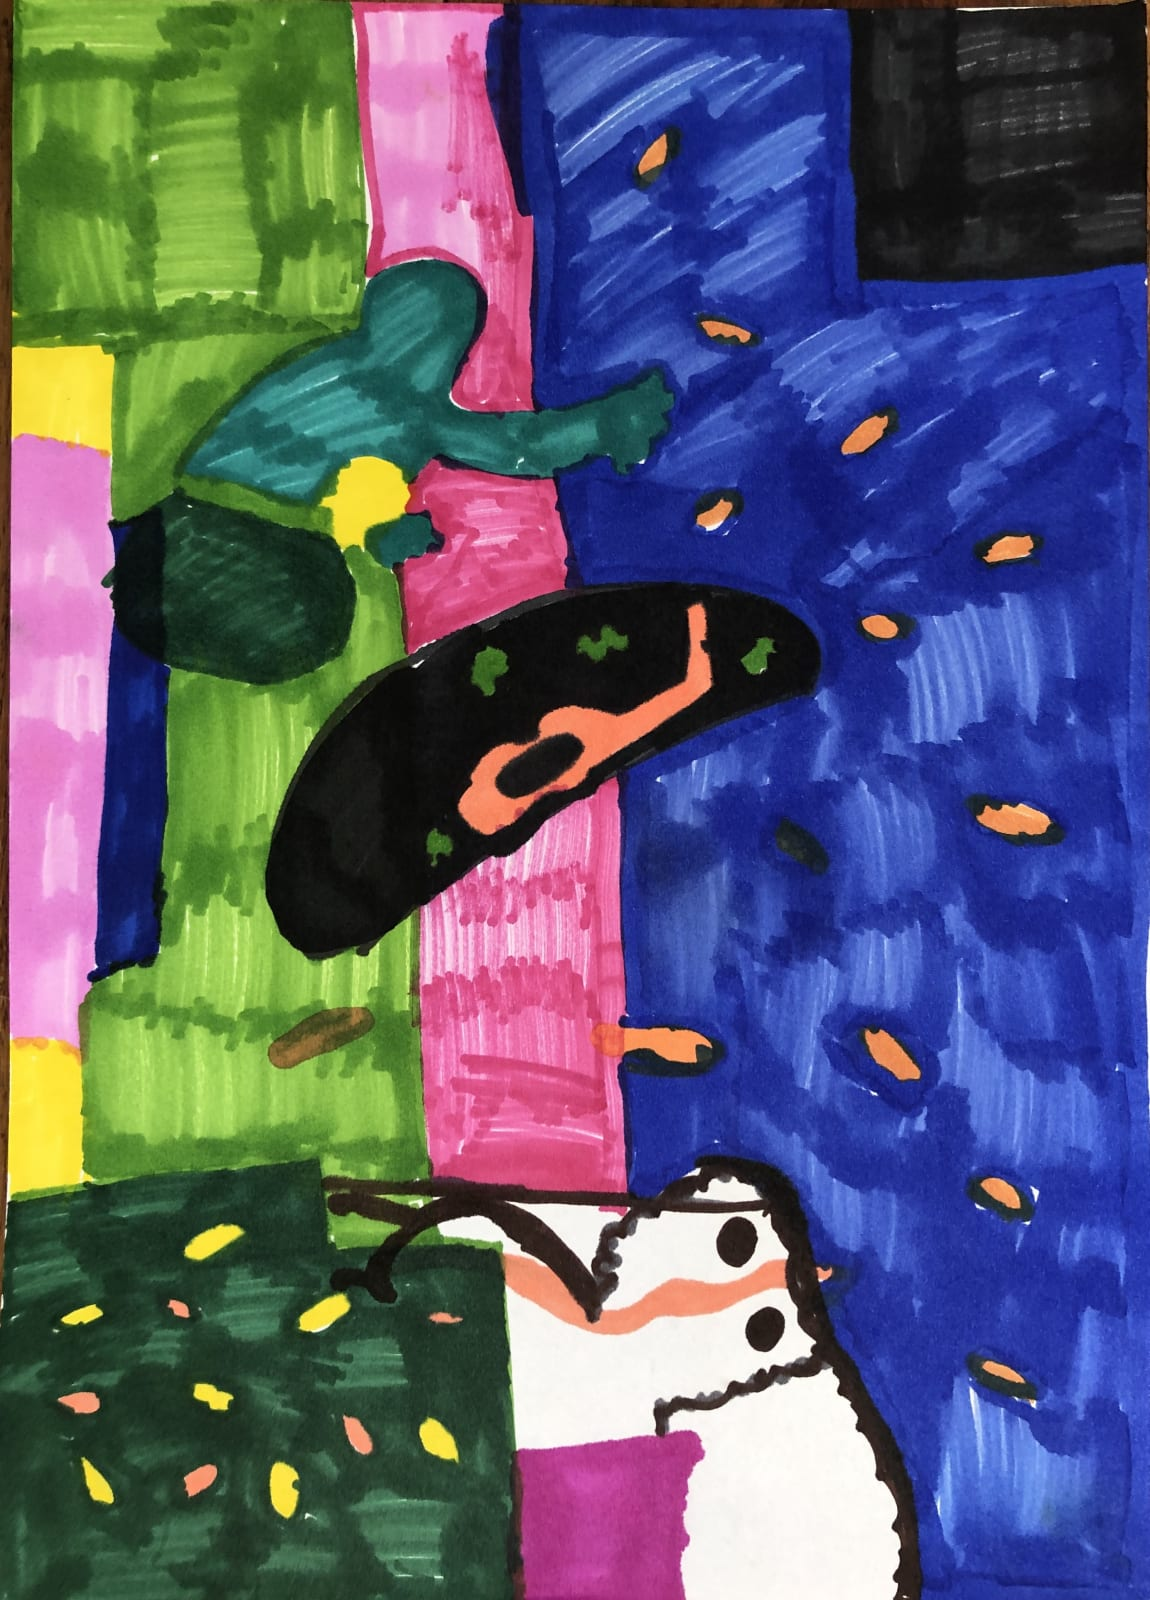 Mari Jones, age 8 Inspired by Matisse